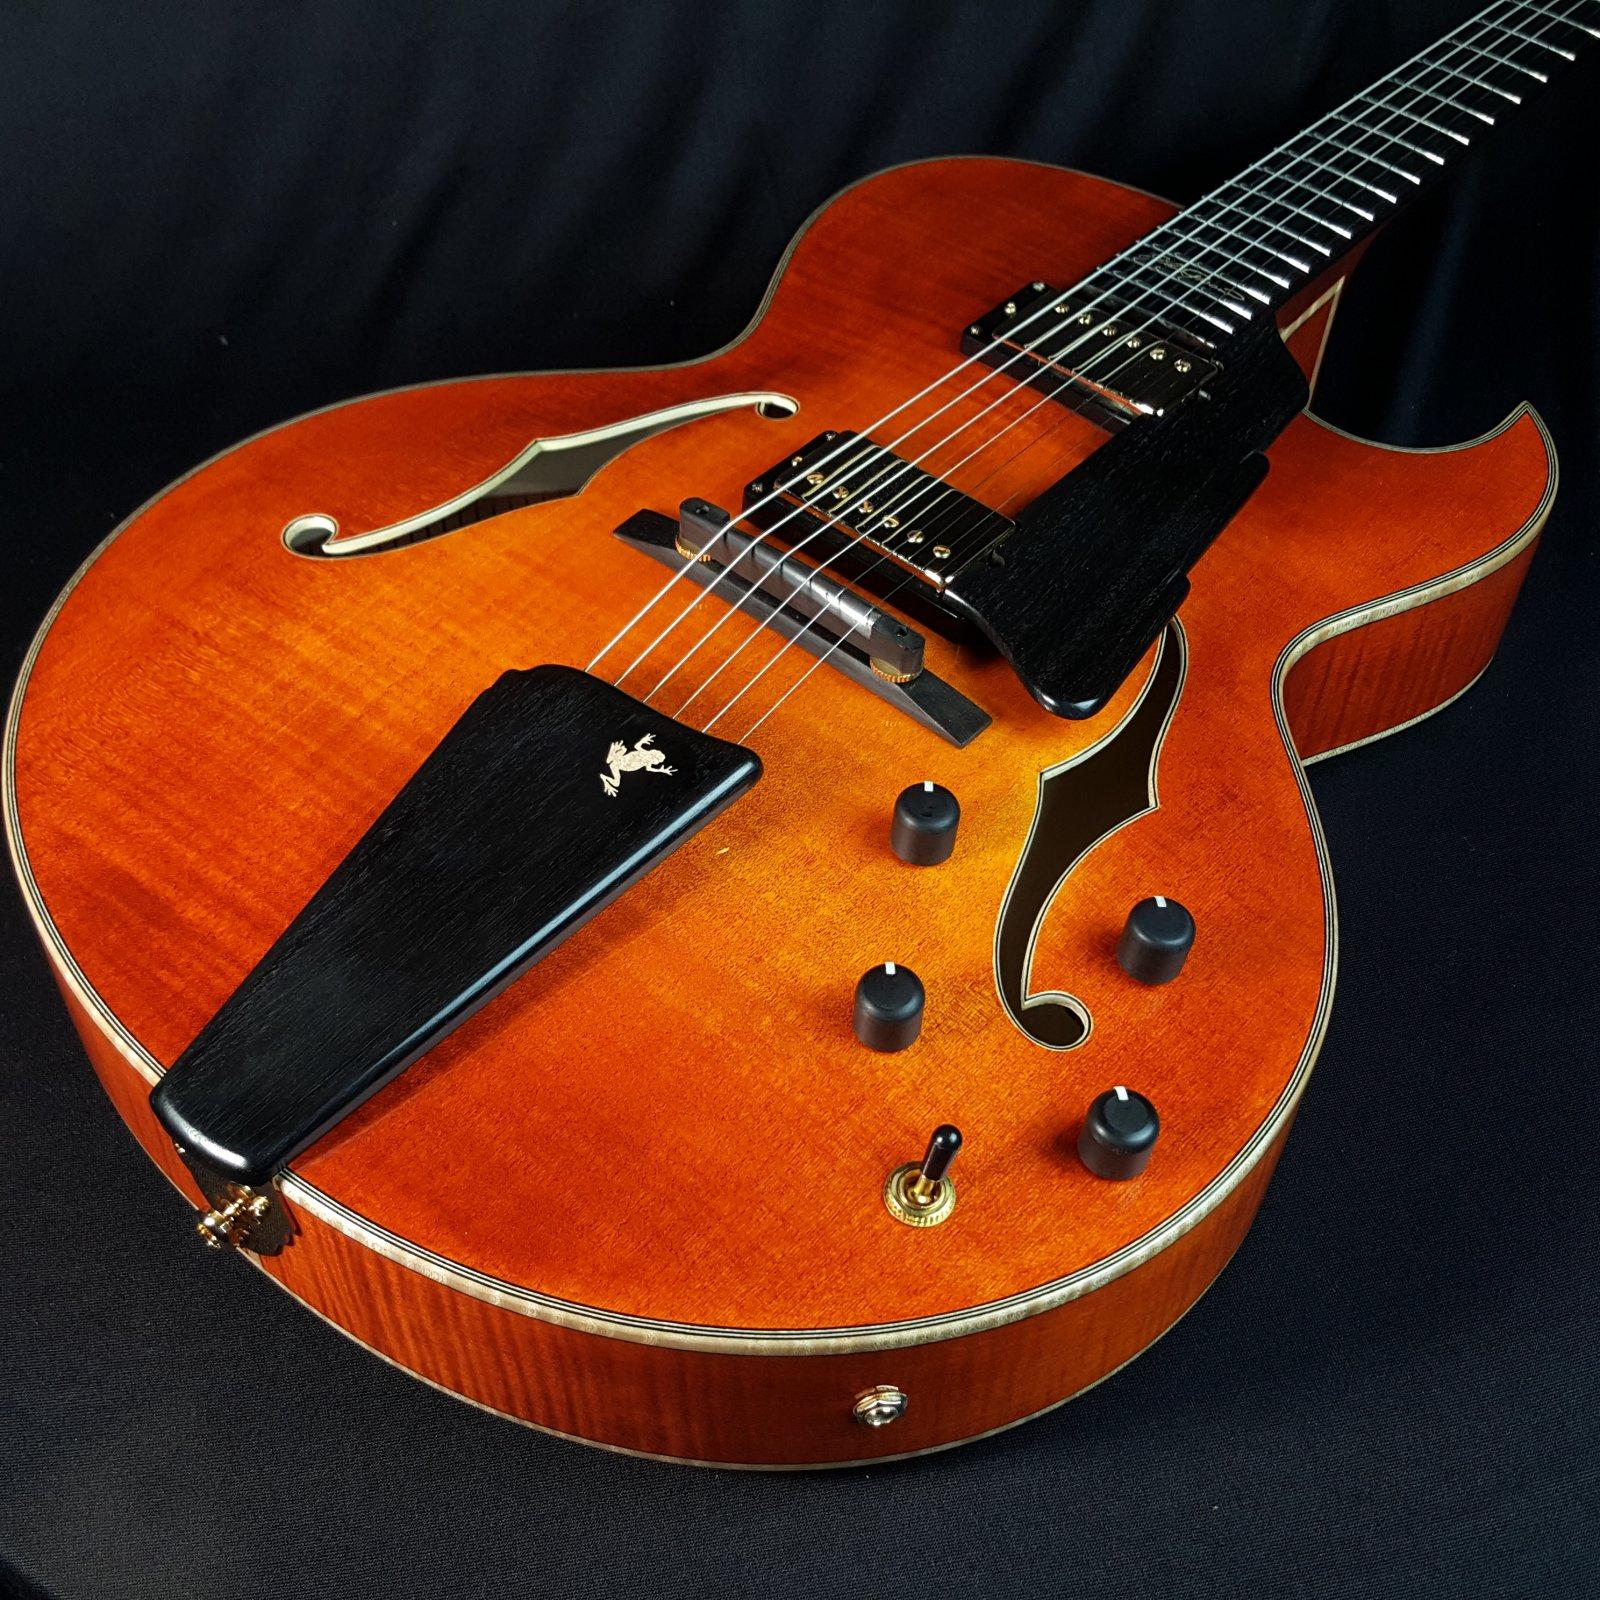 Eastman AR380CE Honey Burst Archtop Guitar With Case